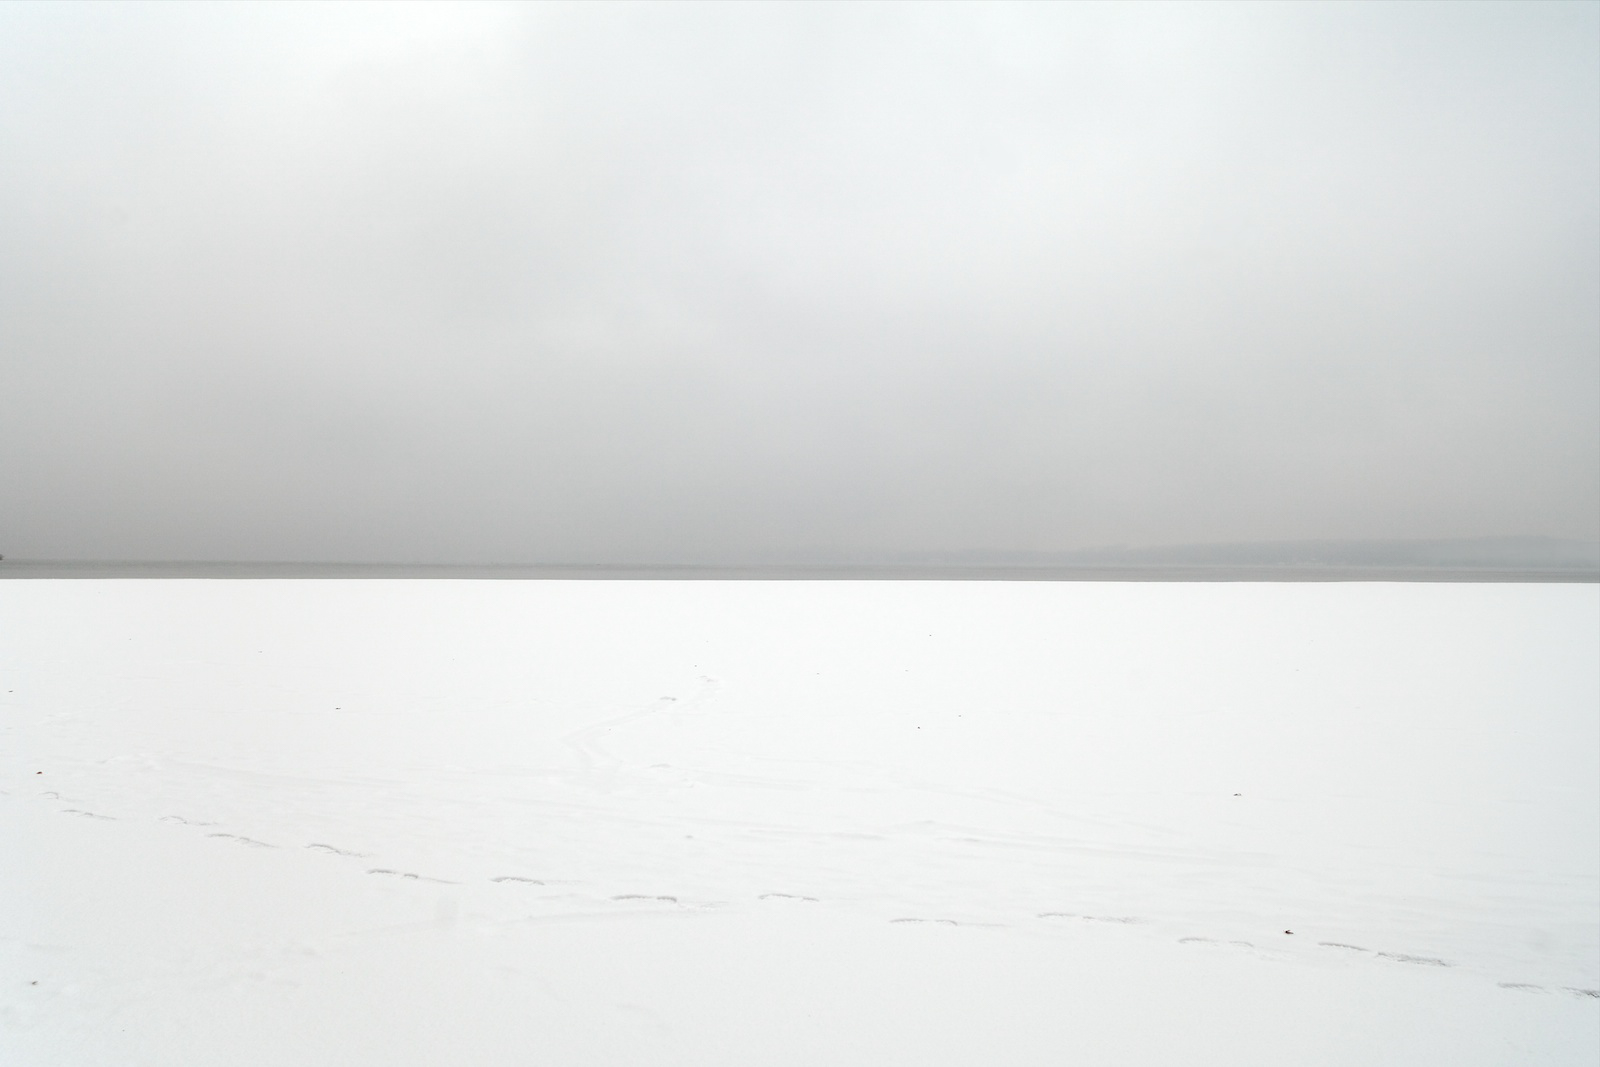 B31 Eis Horizont Leoni.jpg